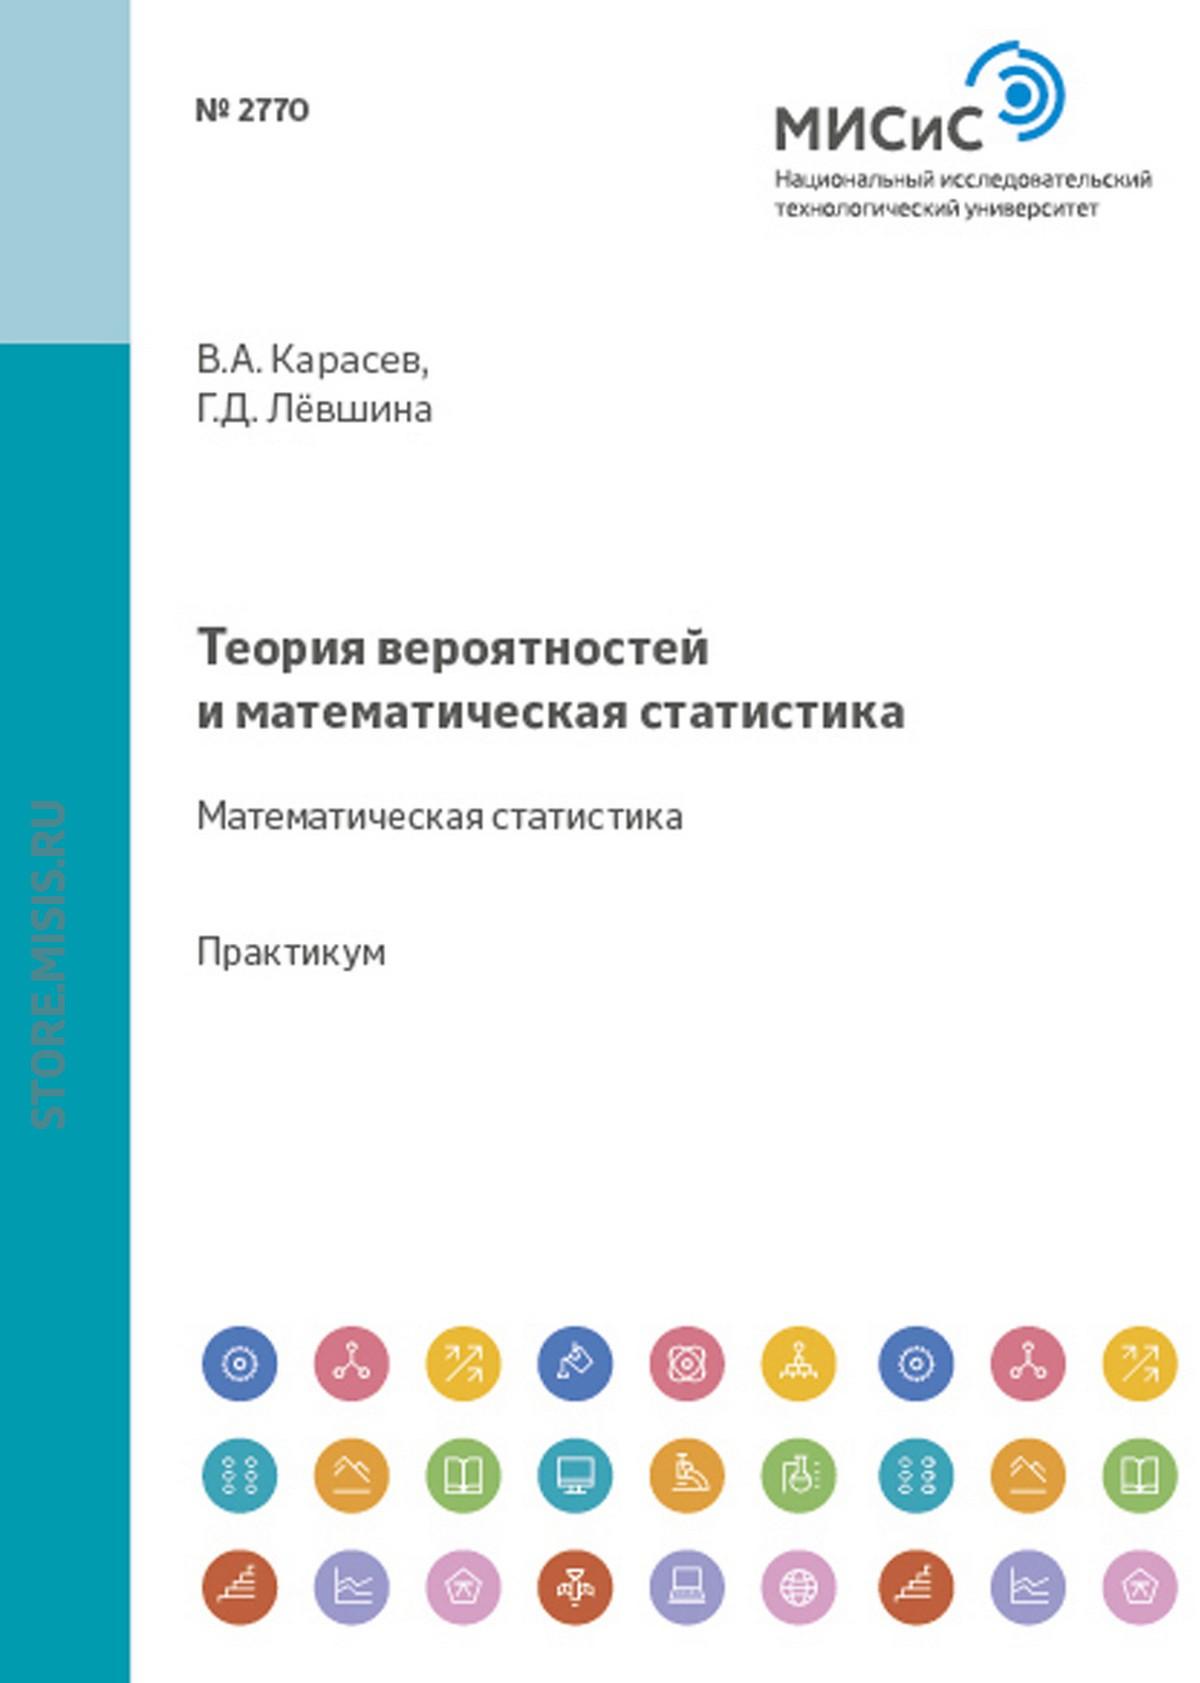 В. А. Карасев Теория вероятностей и математическая статистика. Математическая статистика цена